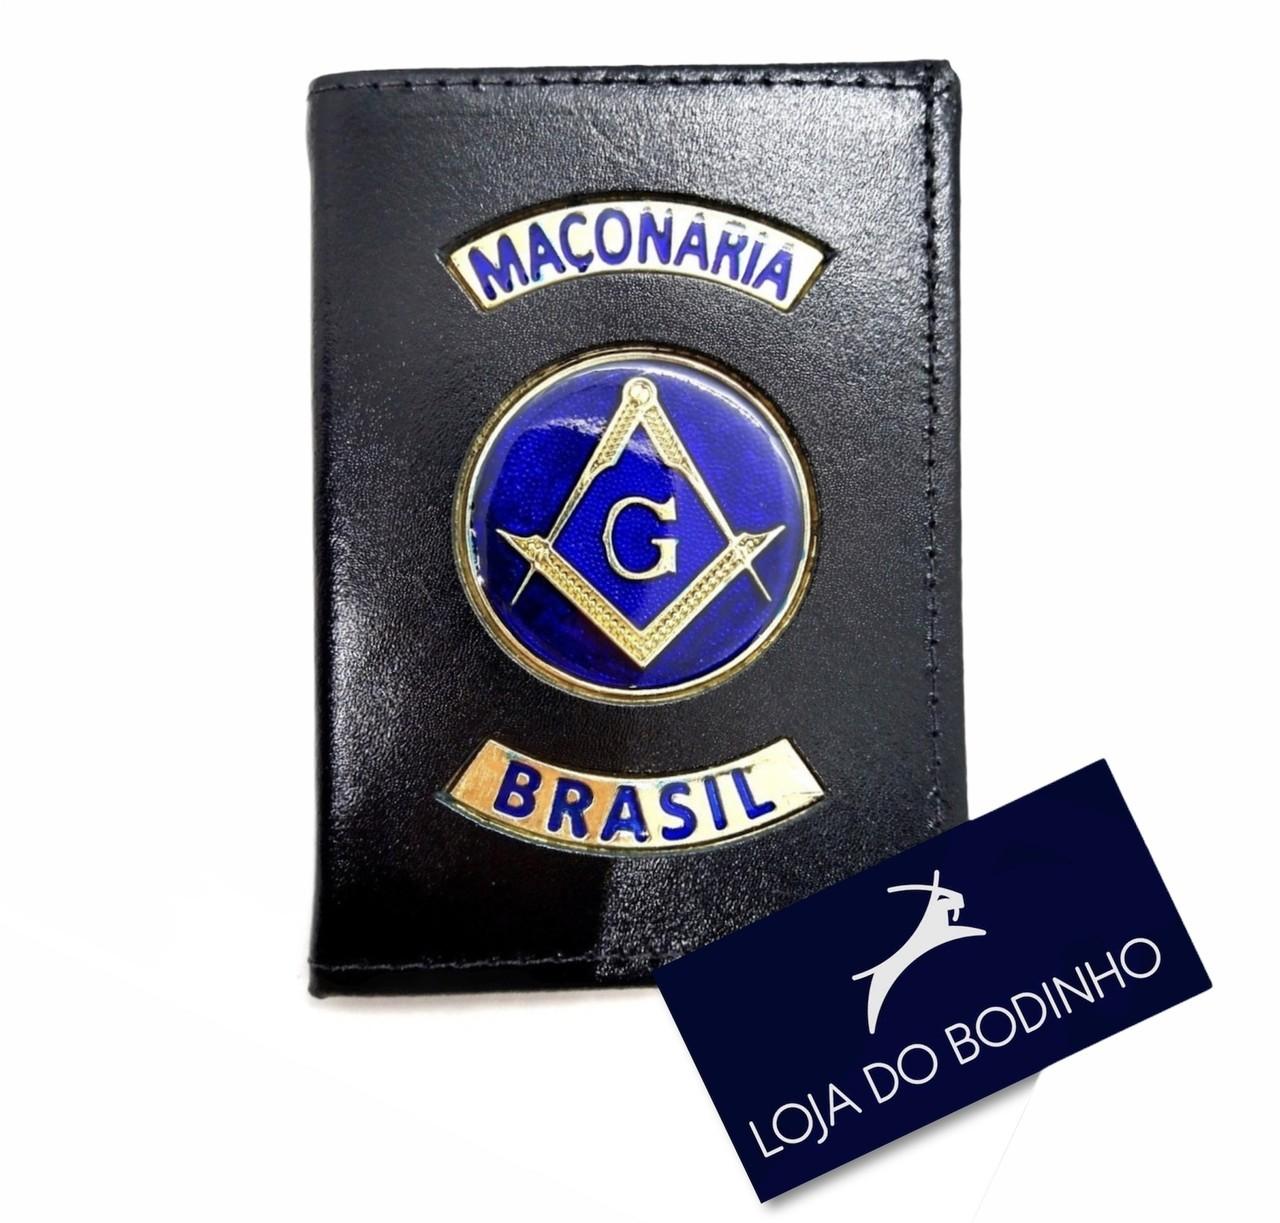 Carteira Distintivo Luxo Couro Preto maçonaria  - Envio 18/02